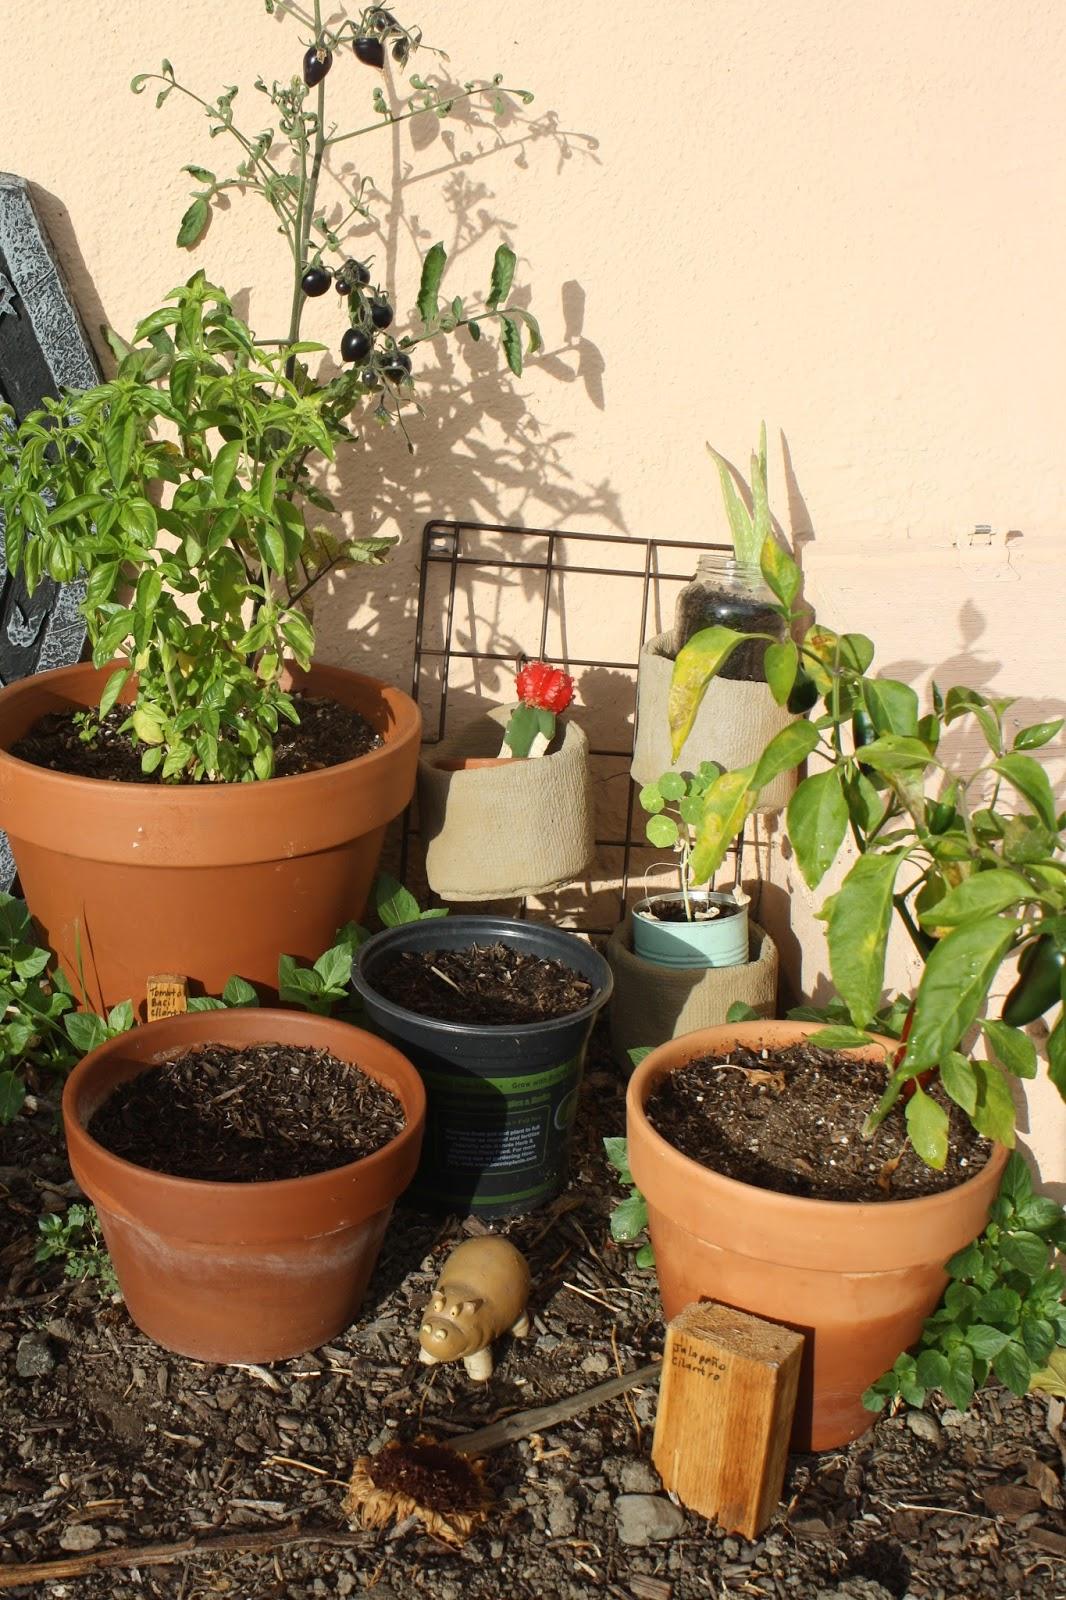 Worm update & photos from the garden